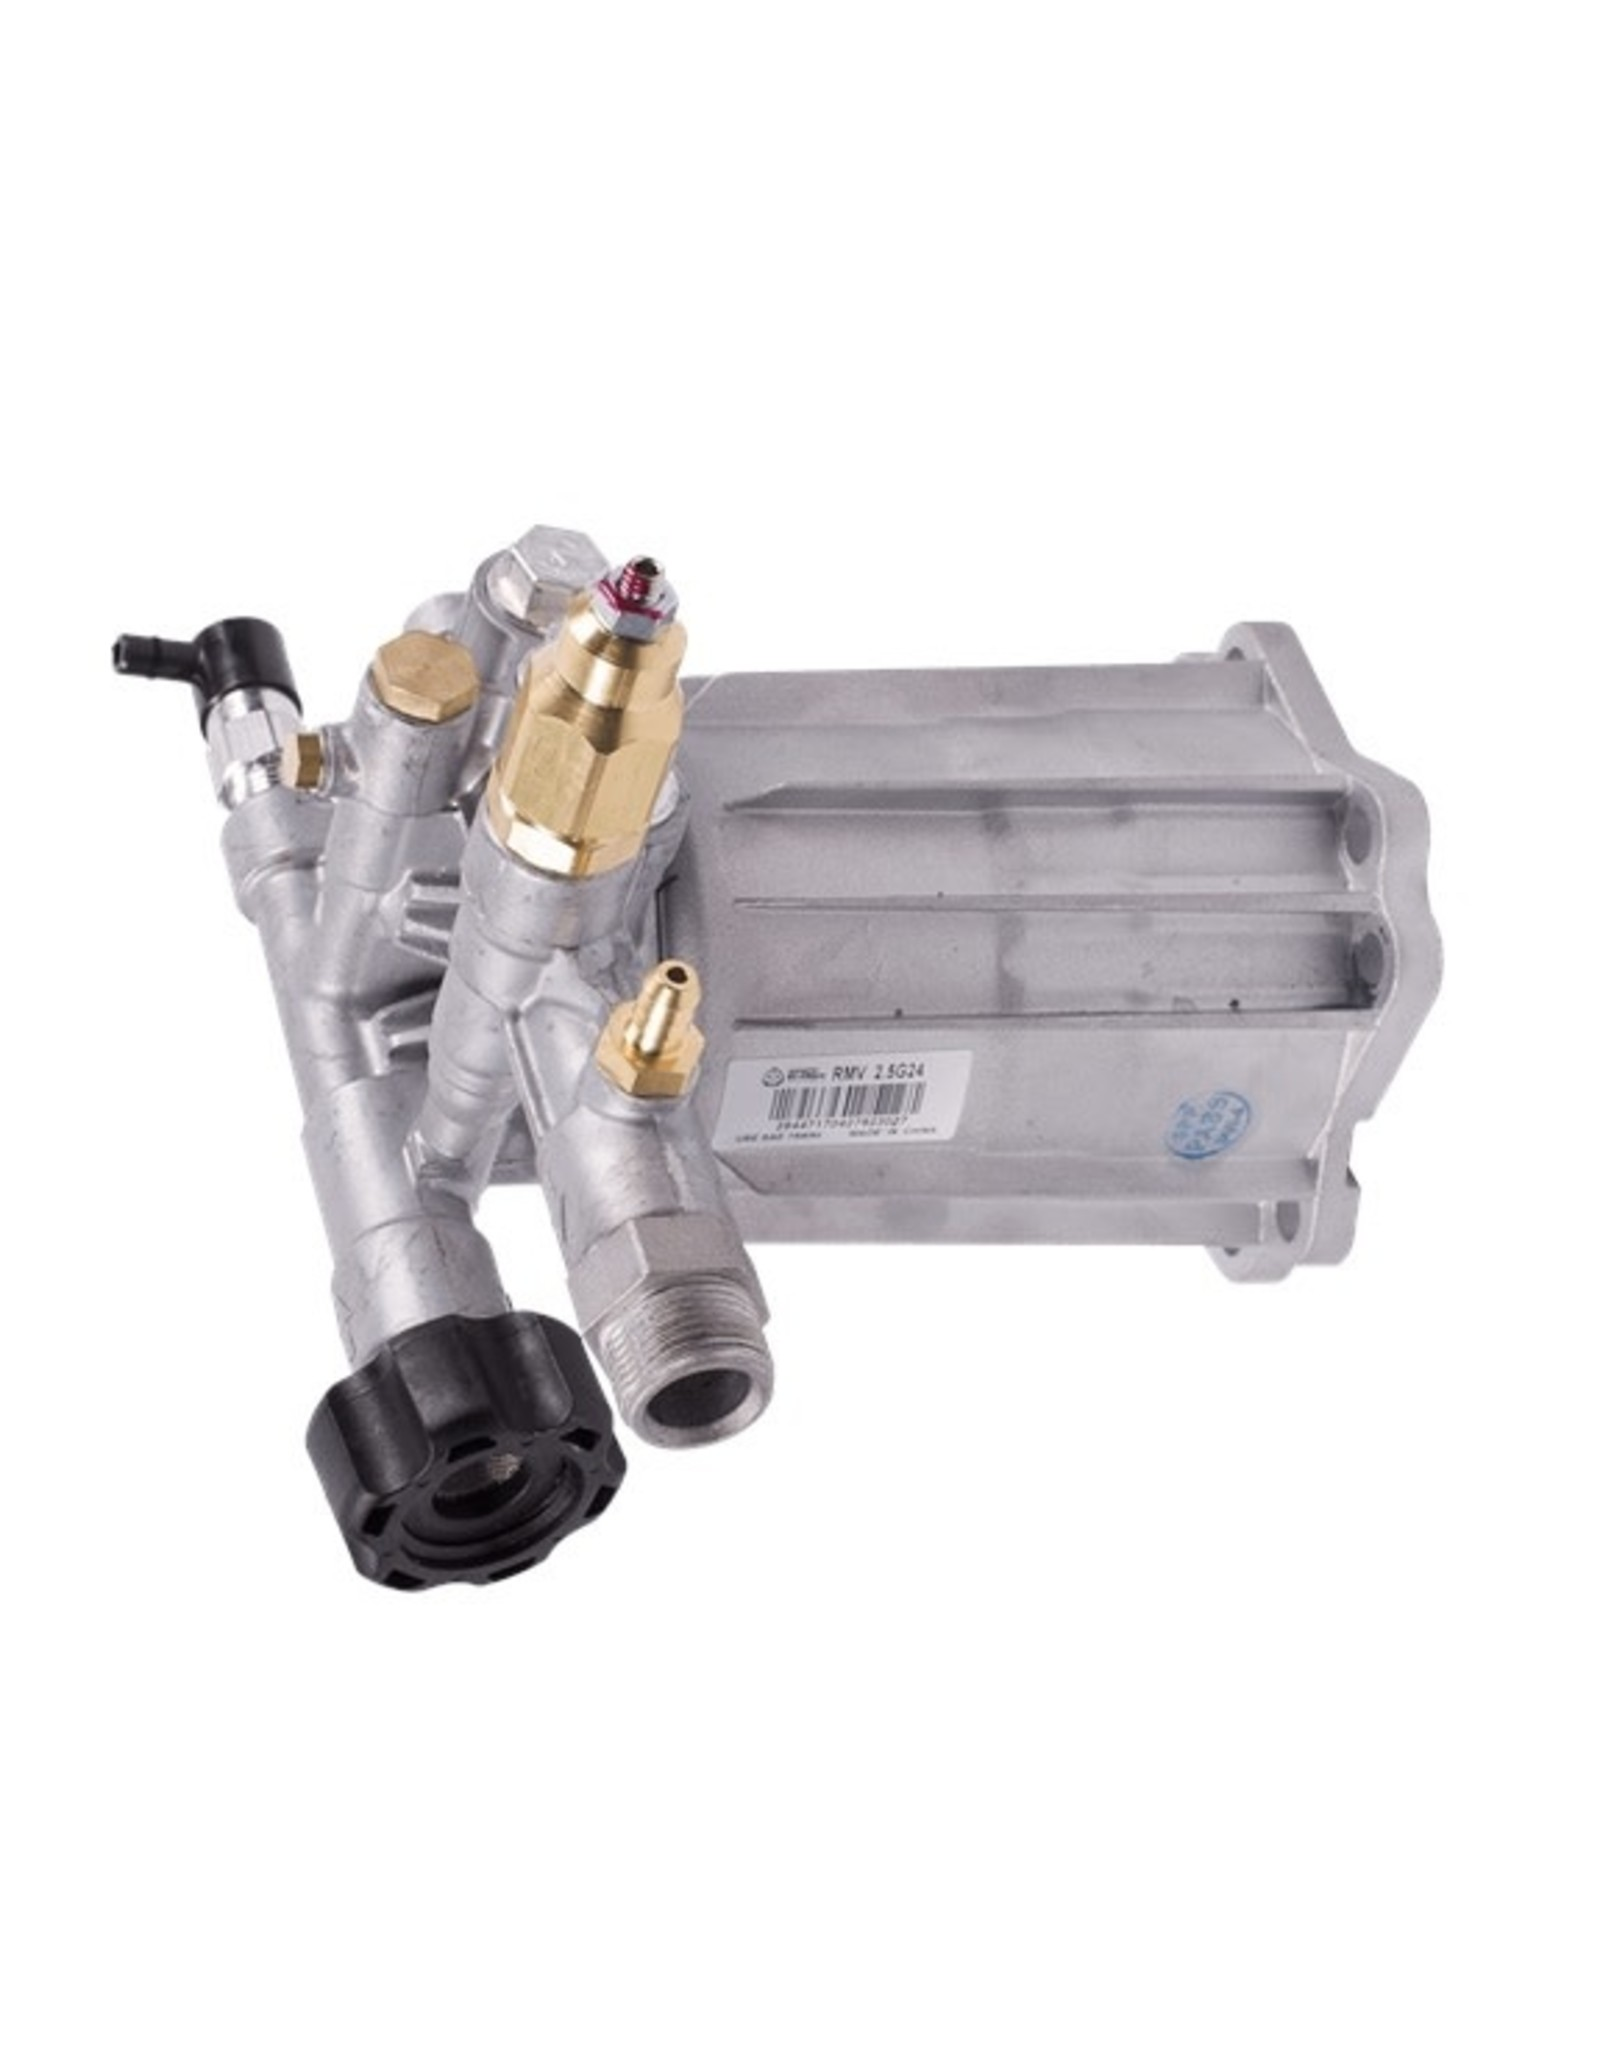 BE 85.120.039B RMV25G24D-F7 Pump Boxed